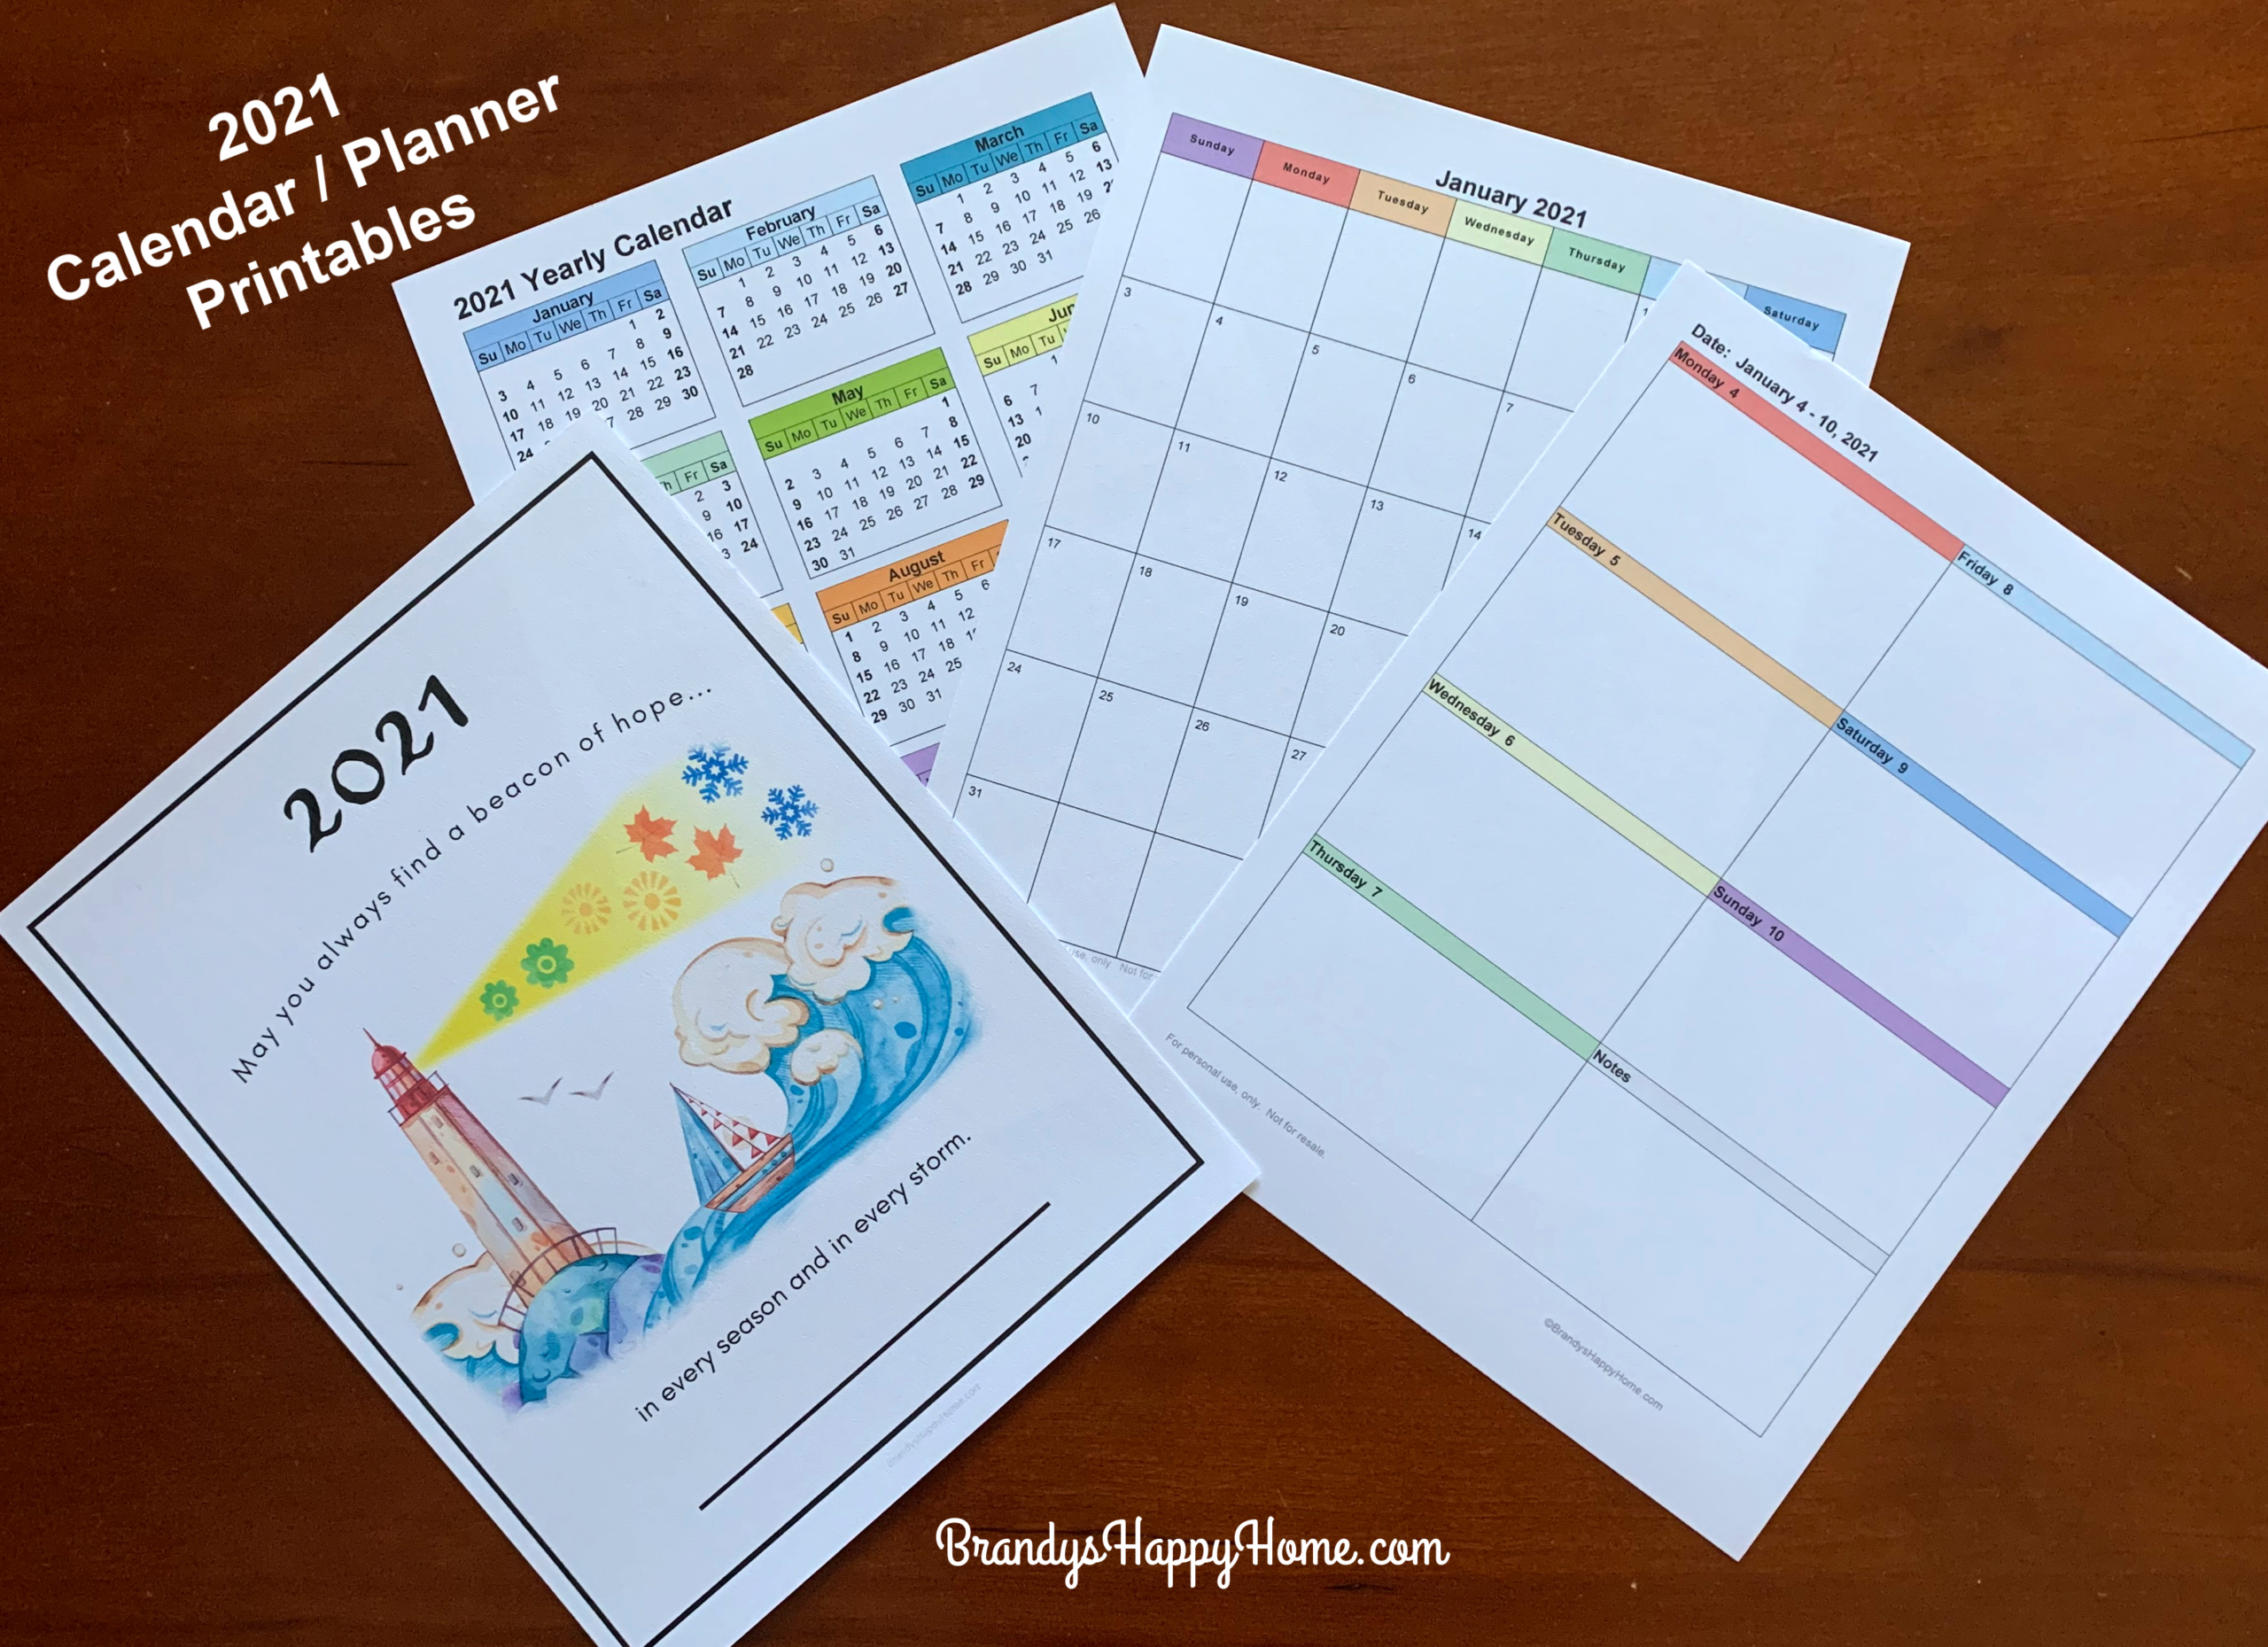 Free 2021 Calendar Planner Printables in 2021-2021 Monthly Planner: 2 Year